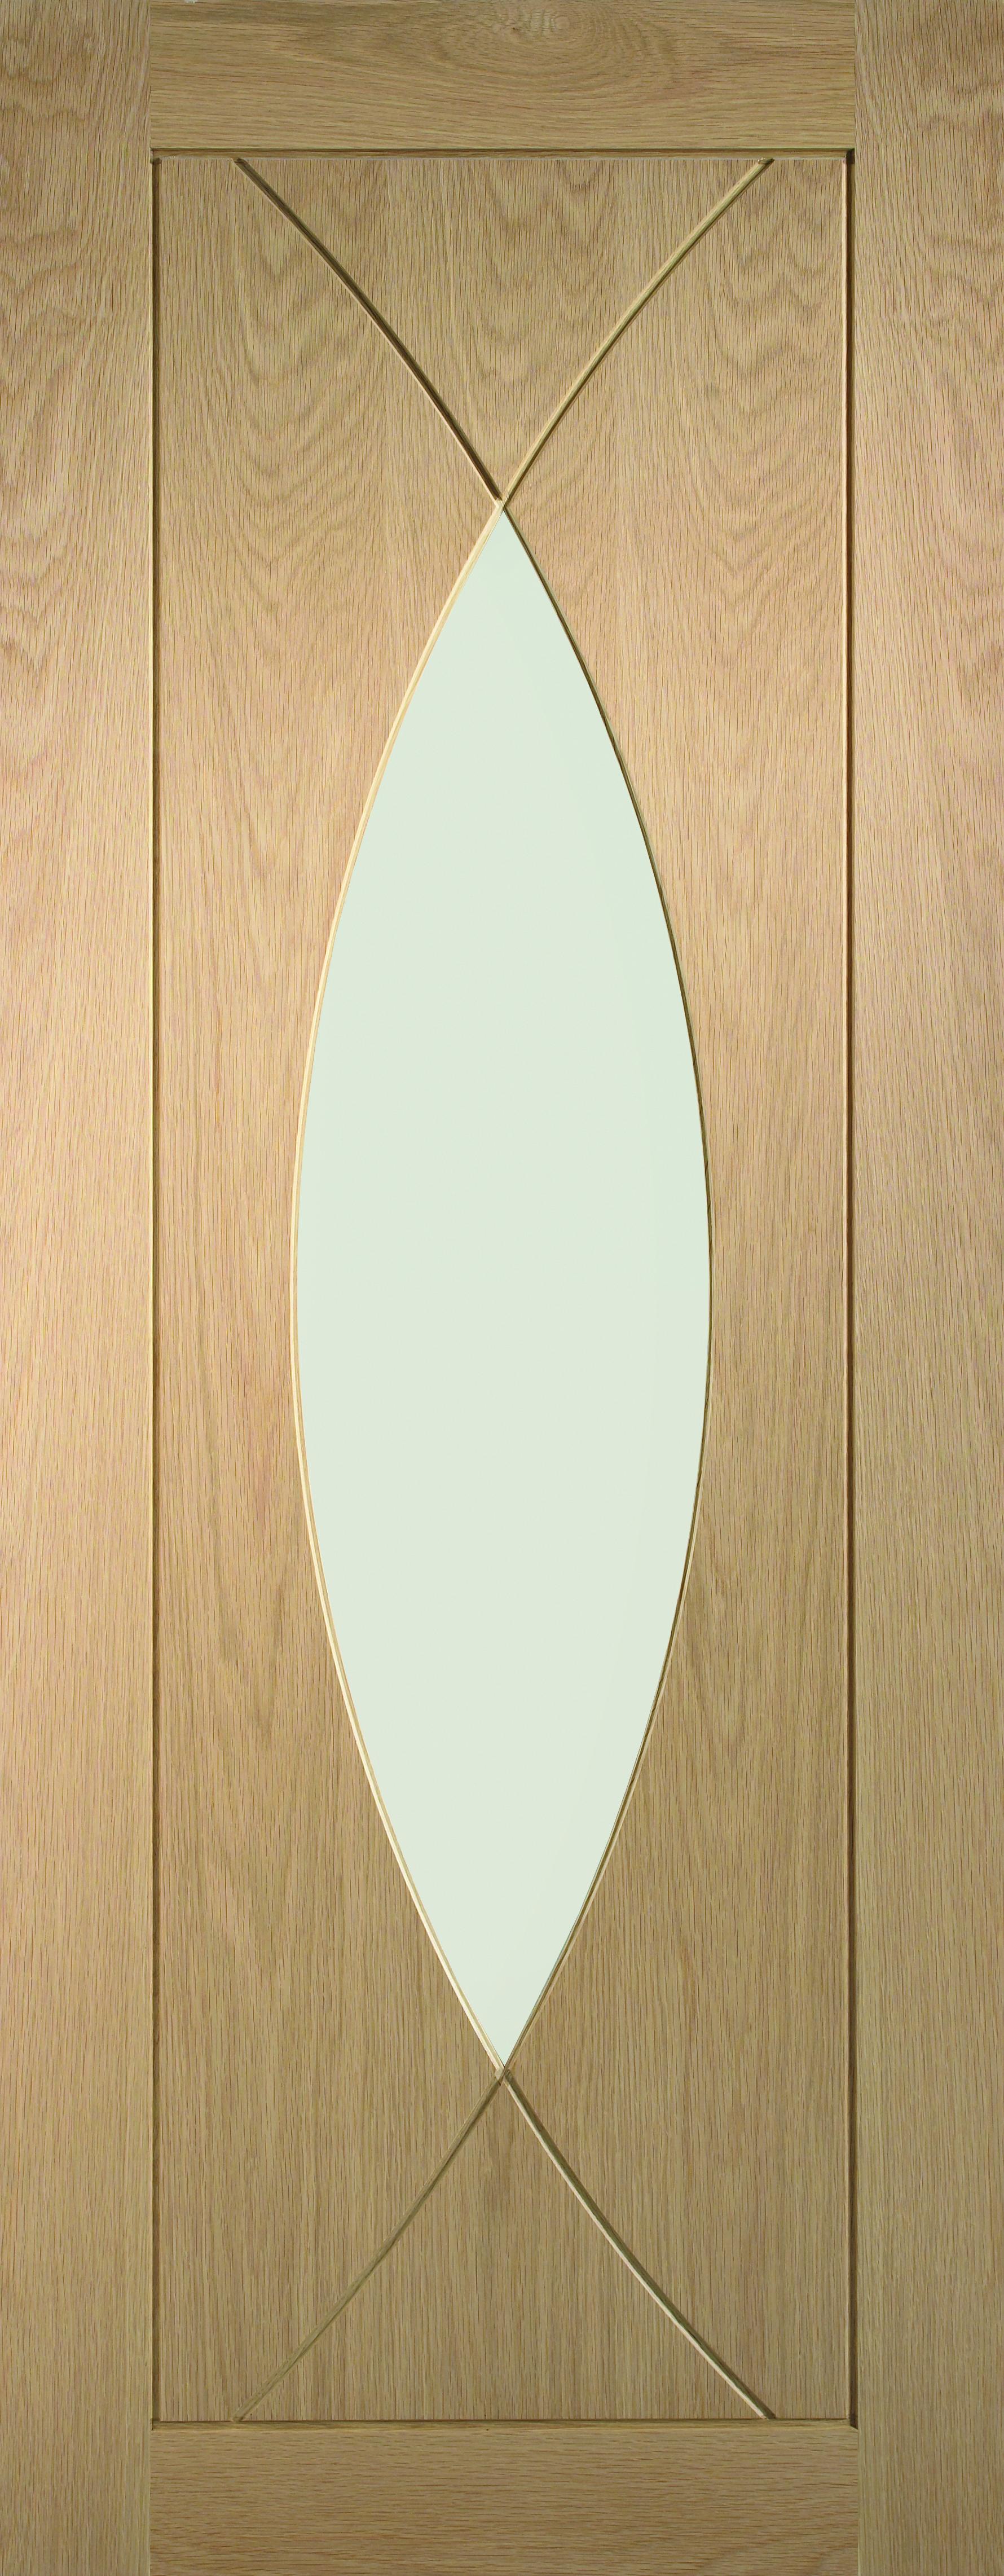 Oak Pesaro with Clear Glass.jpg